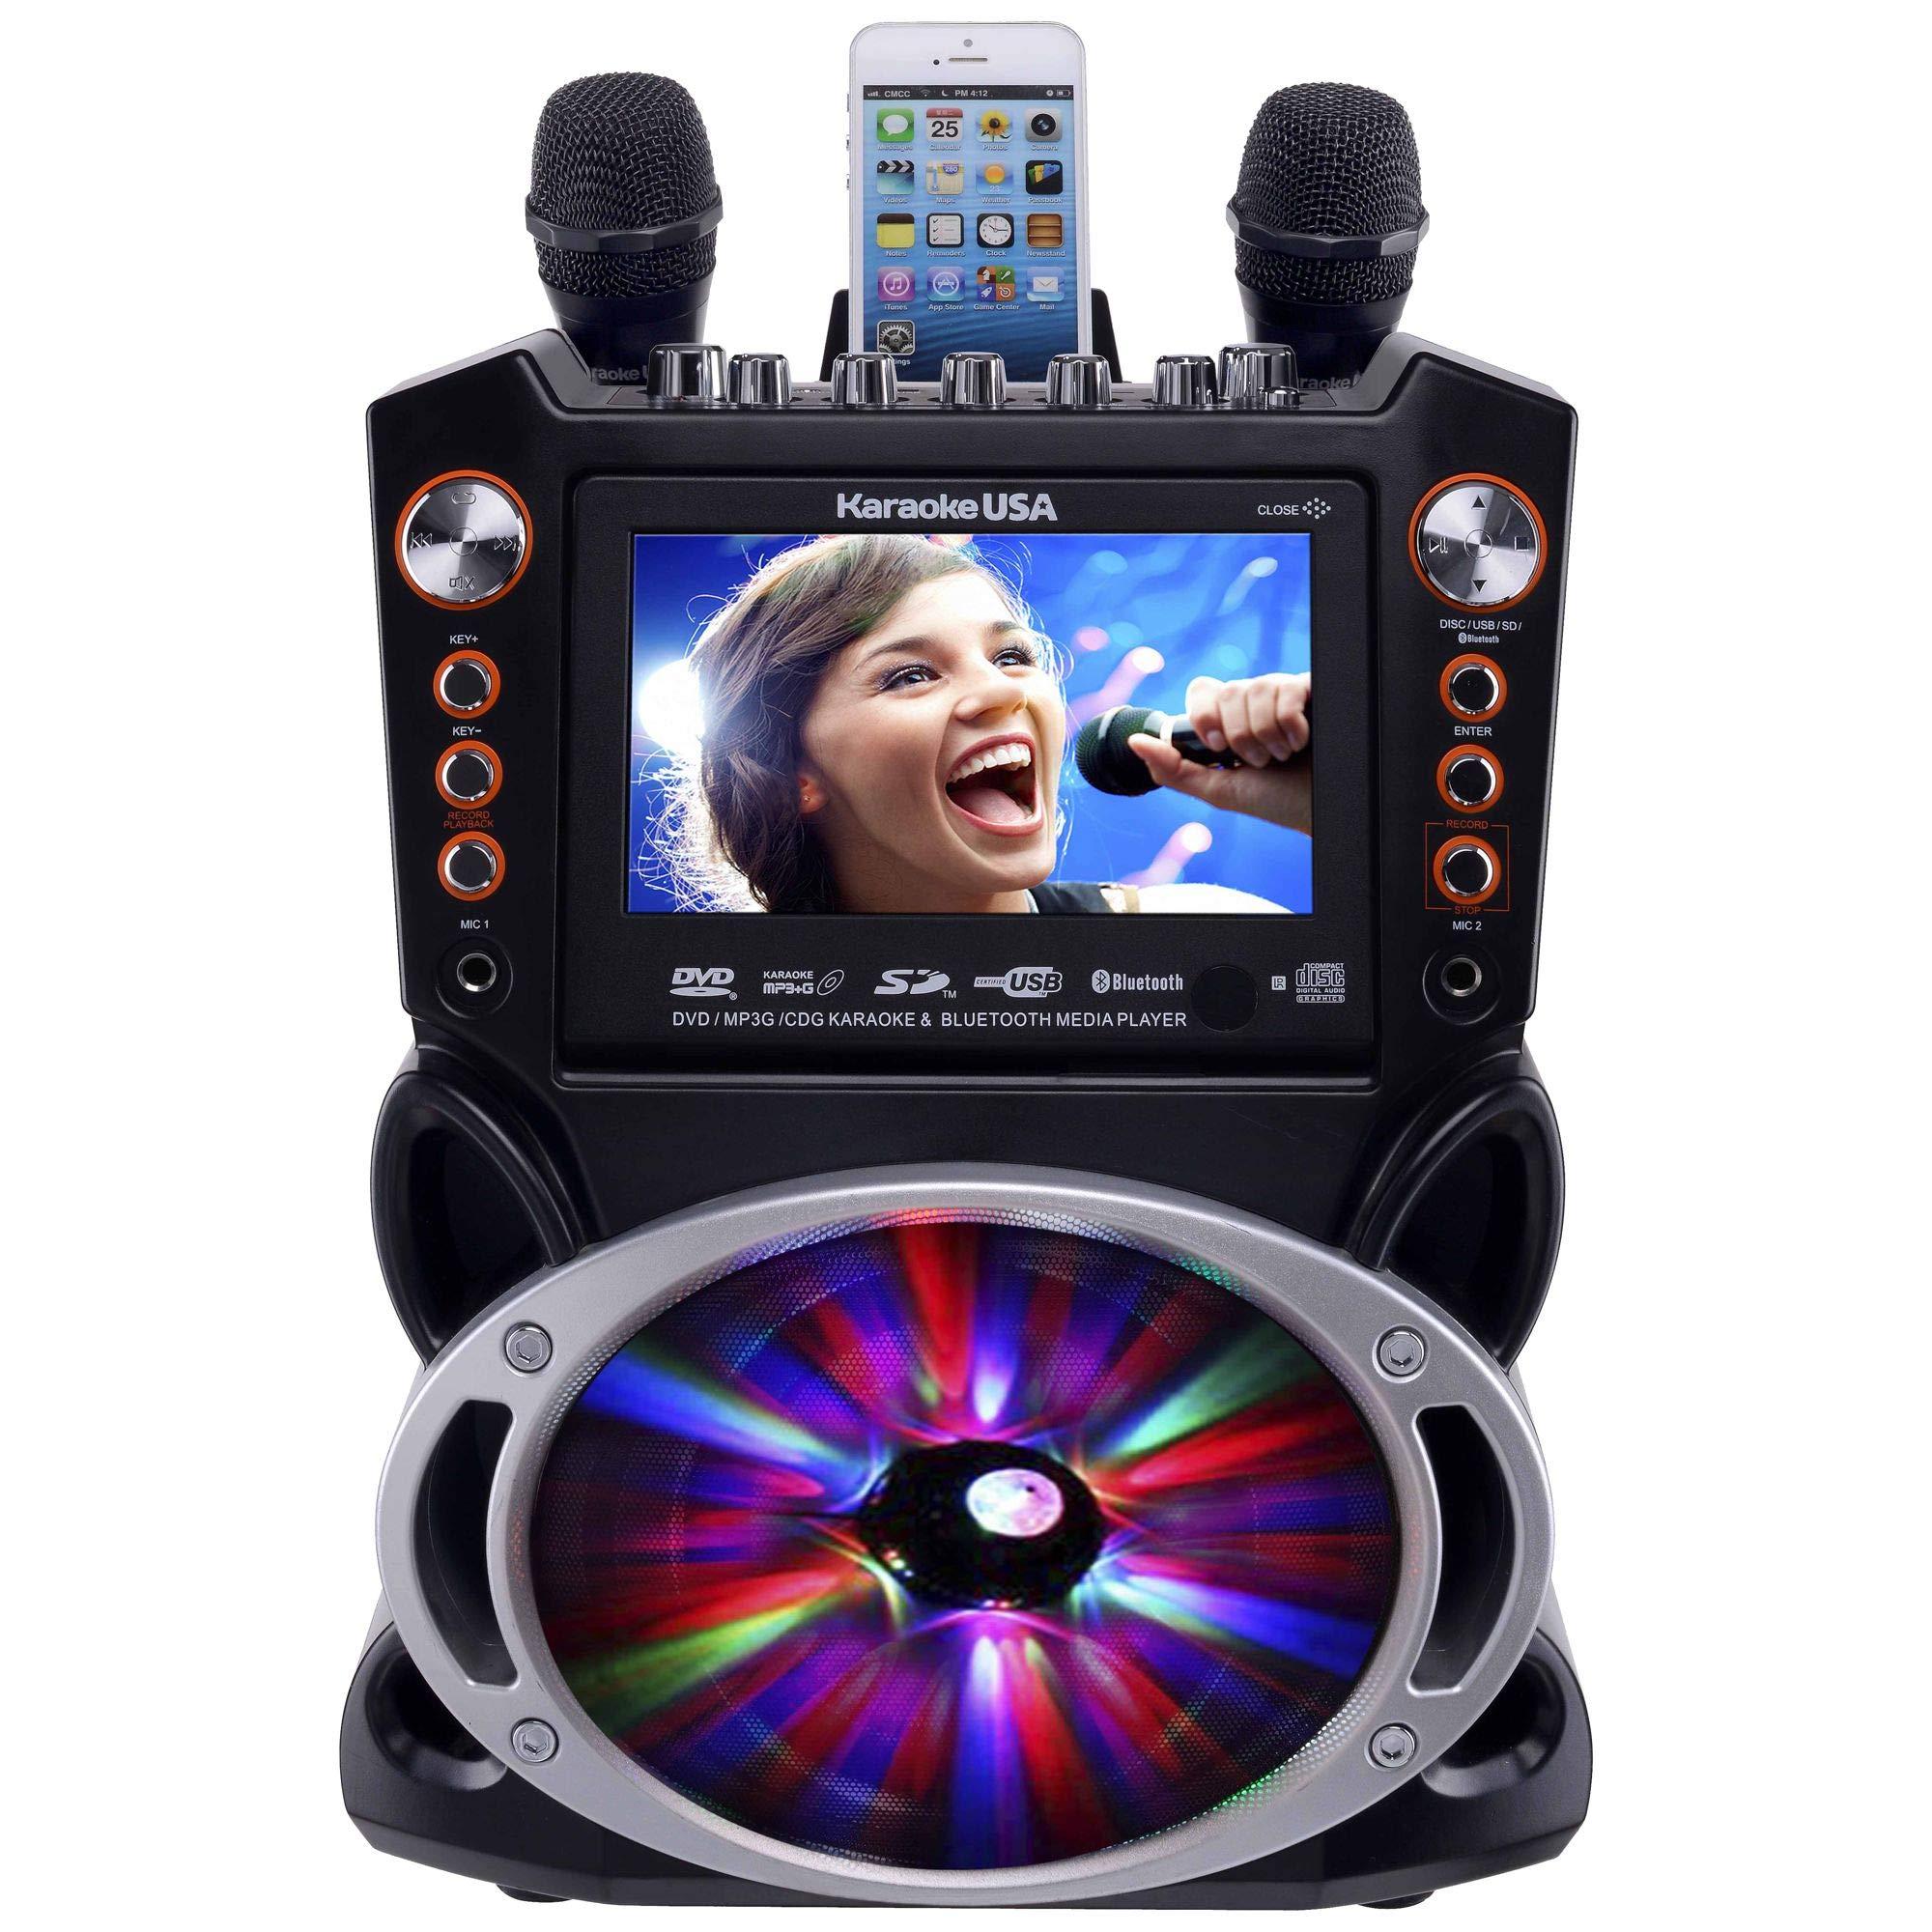 Karaoke USA GF846 DVD/CDG/MP3G Karaoke Machine with 7'' TFT Color Screen, Record, Bluetooth and LED Sync Lights by Karaoke USA (Image #1)